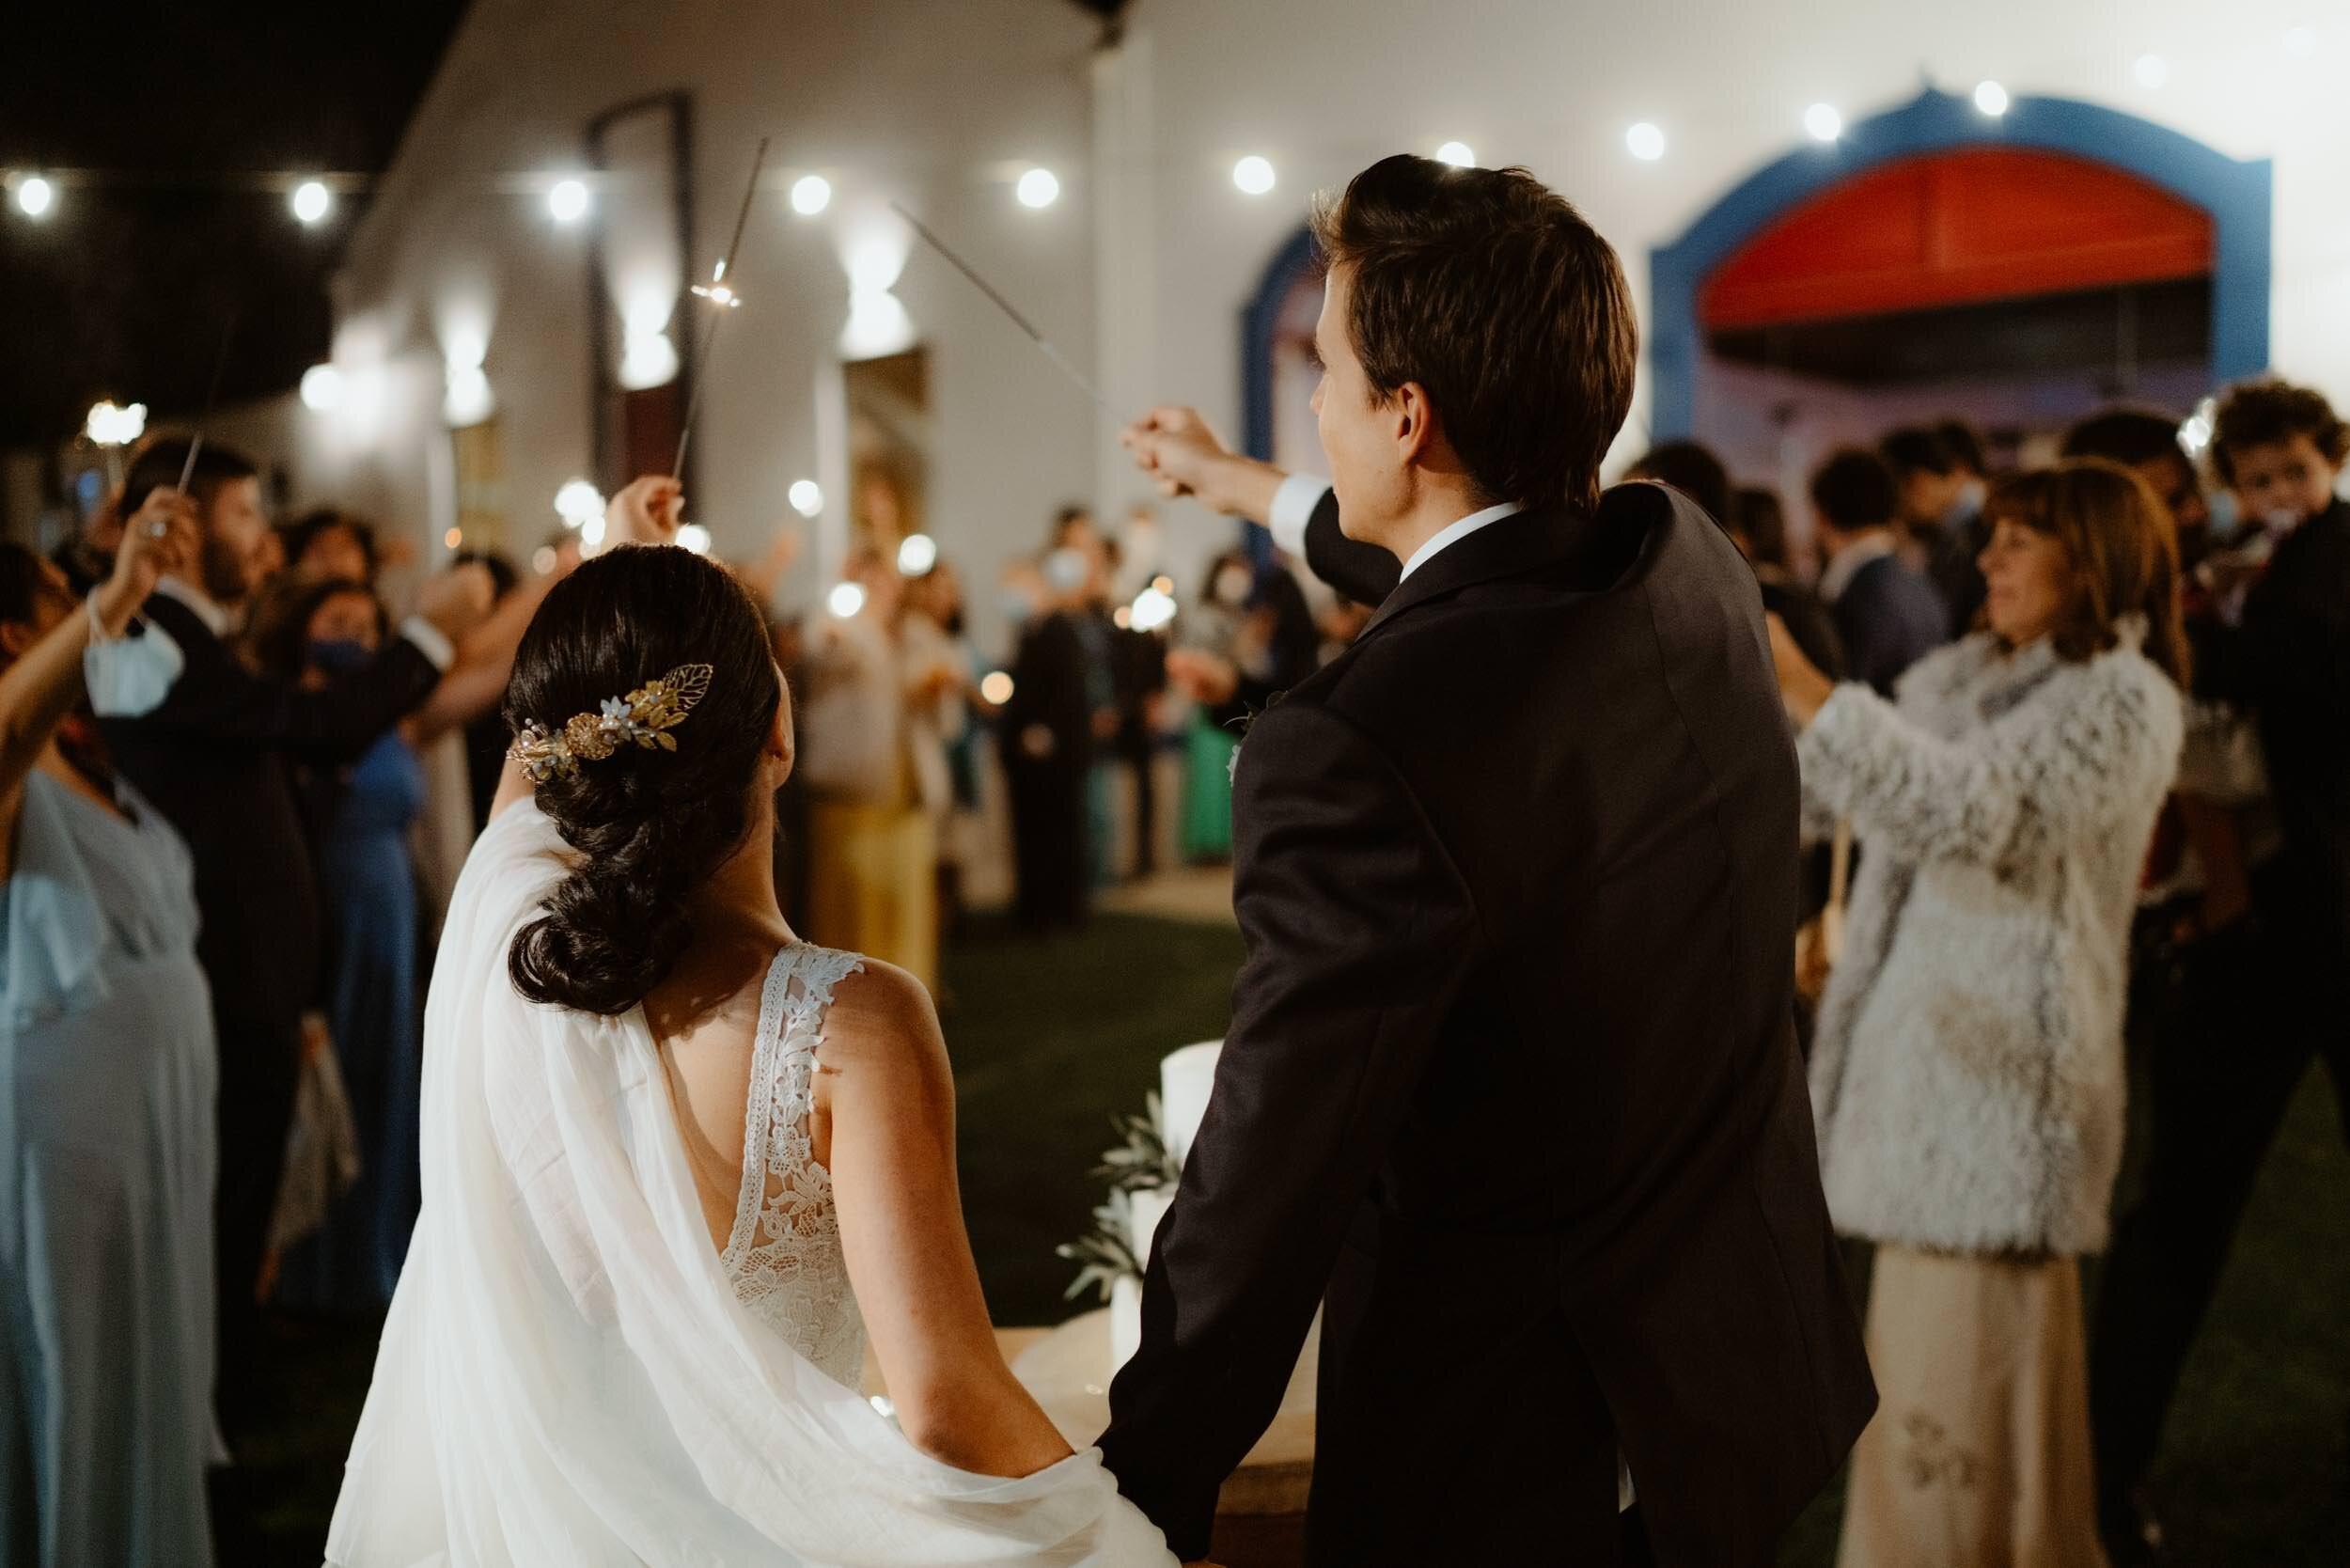 wedding bodas weddingday photography